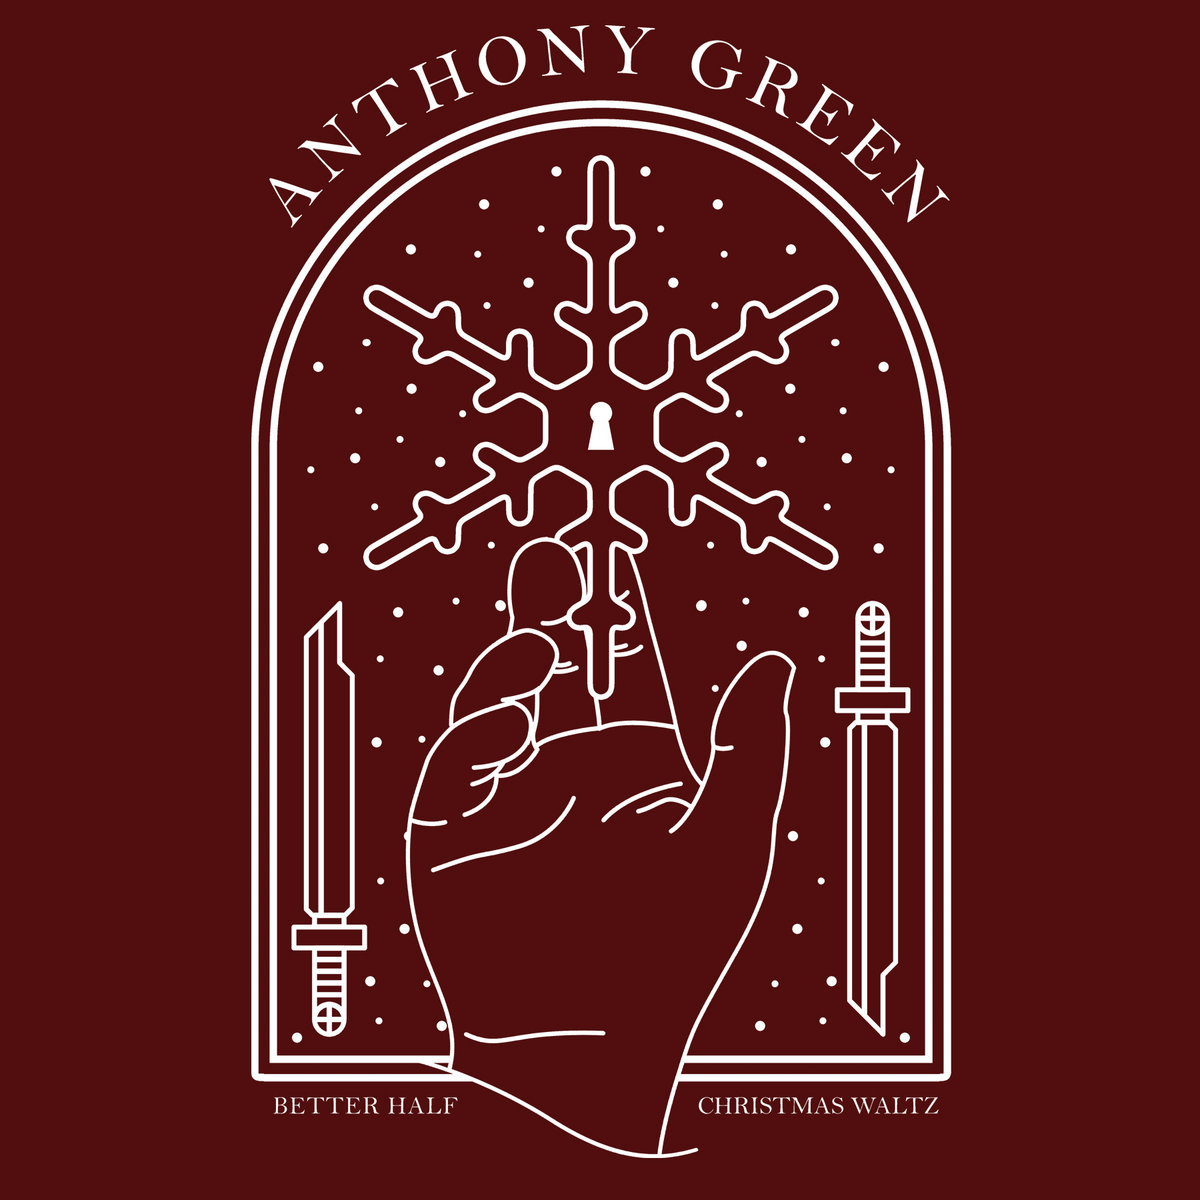 Christmas Waltz Chords.Christmas Waltz Anthony Green